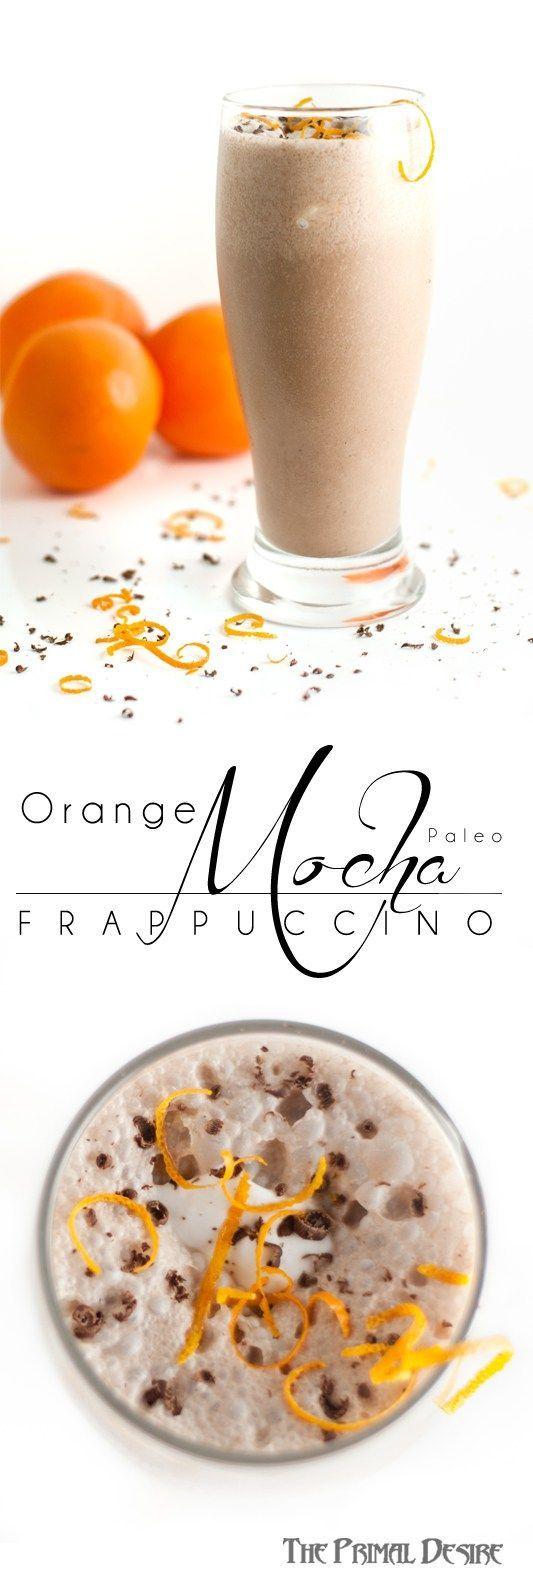 In honor of Zoolander 2: Zoolander Paleo Orange Mocha Frappuccino - quick, easy and yummy! http://theprimaldesire.com/zoolander-paleo-orange-mocha-frappuccino